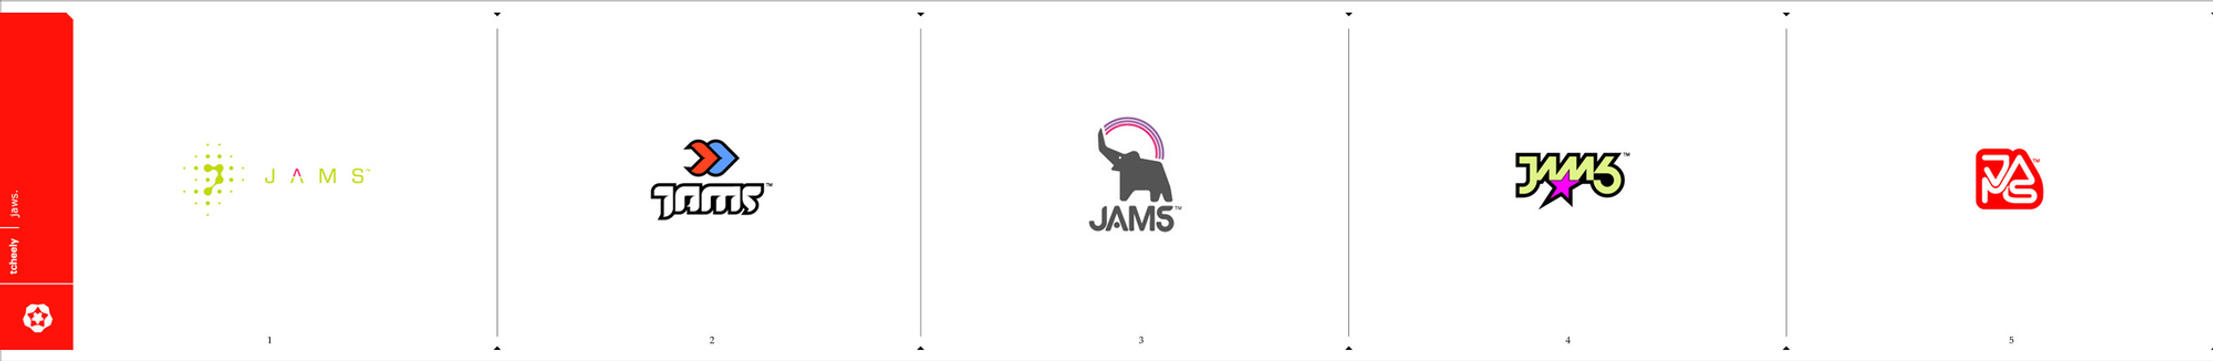 JAMS logo by Tcheely